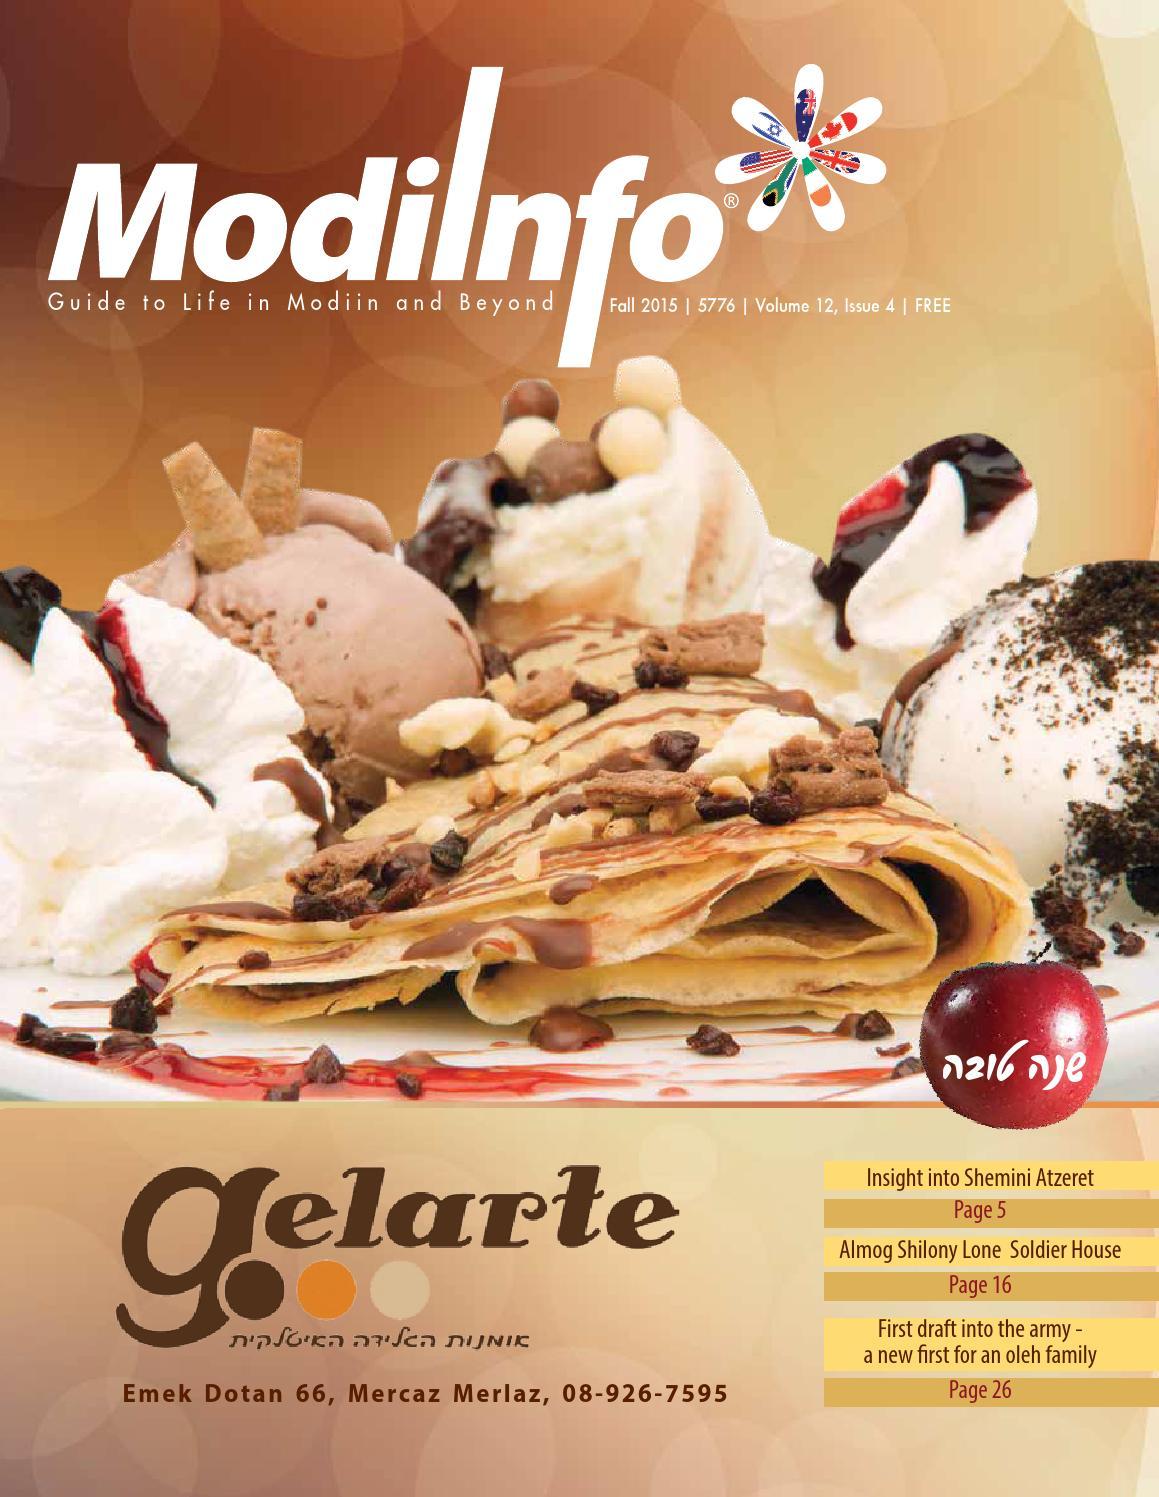 Modiinfo sep2015 for web